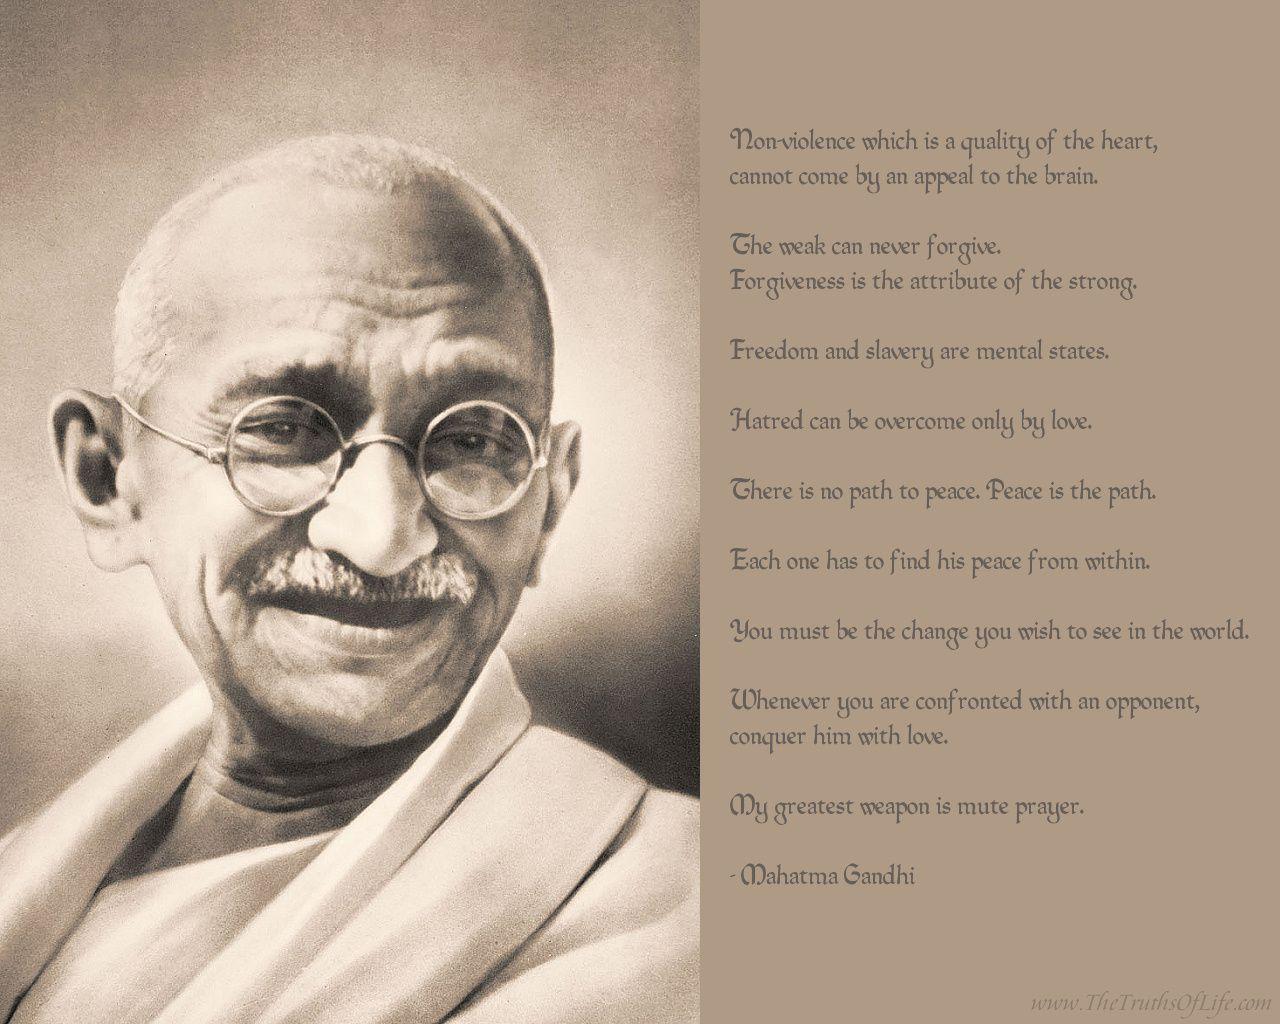 Mahatma Gandhi Quotes On Love Spiritualismnationalismthe Land Of India  Mahatma Gandhi Is